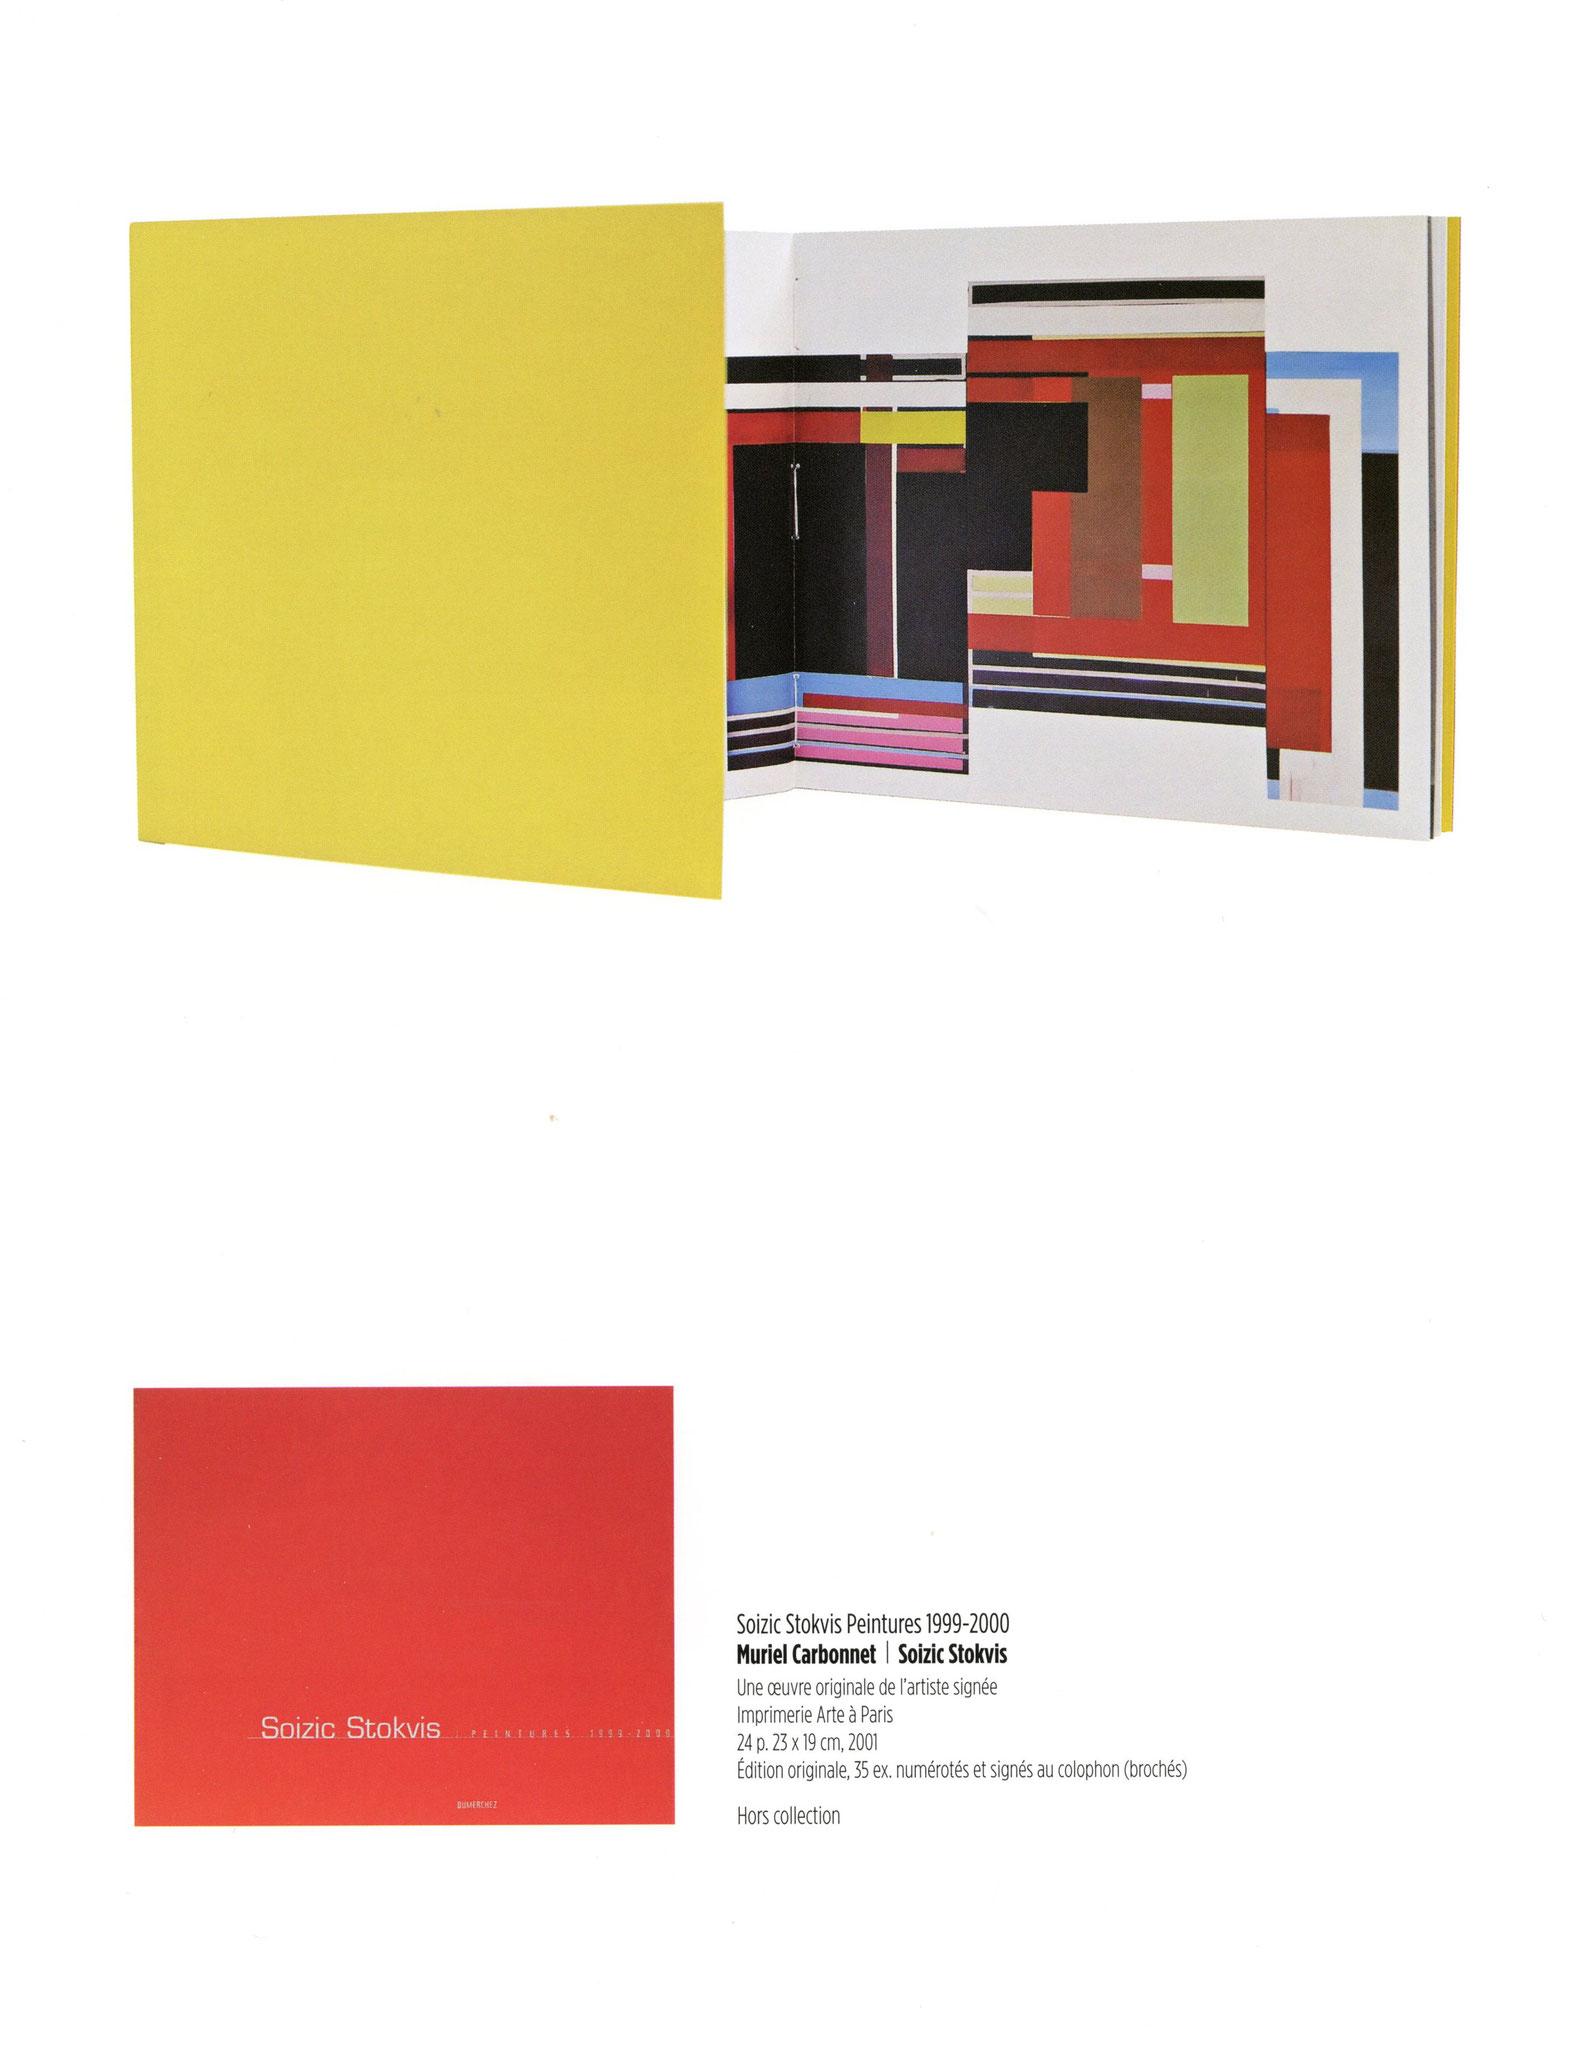 Soizic Stokvis Peintures 1999-2000 - Muriel Carbonnet / Soizic Stokvis